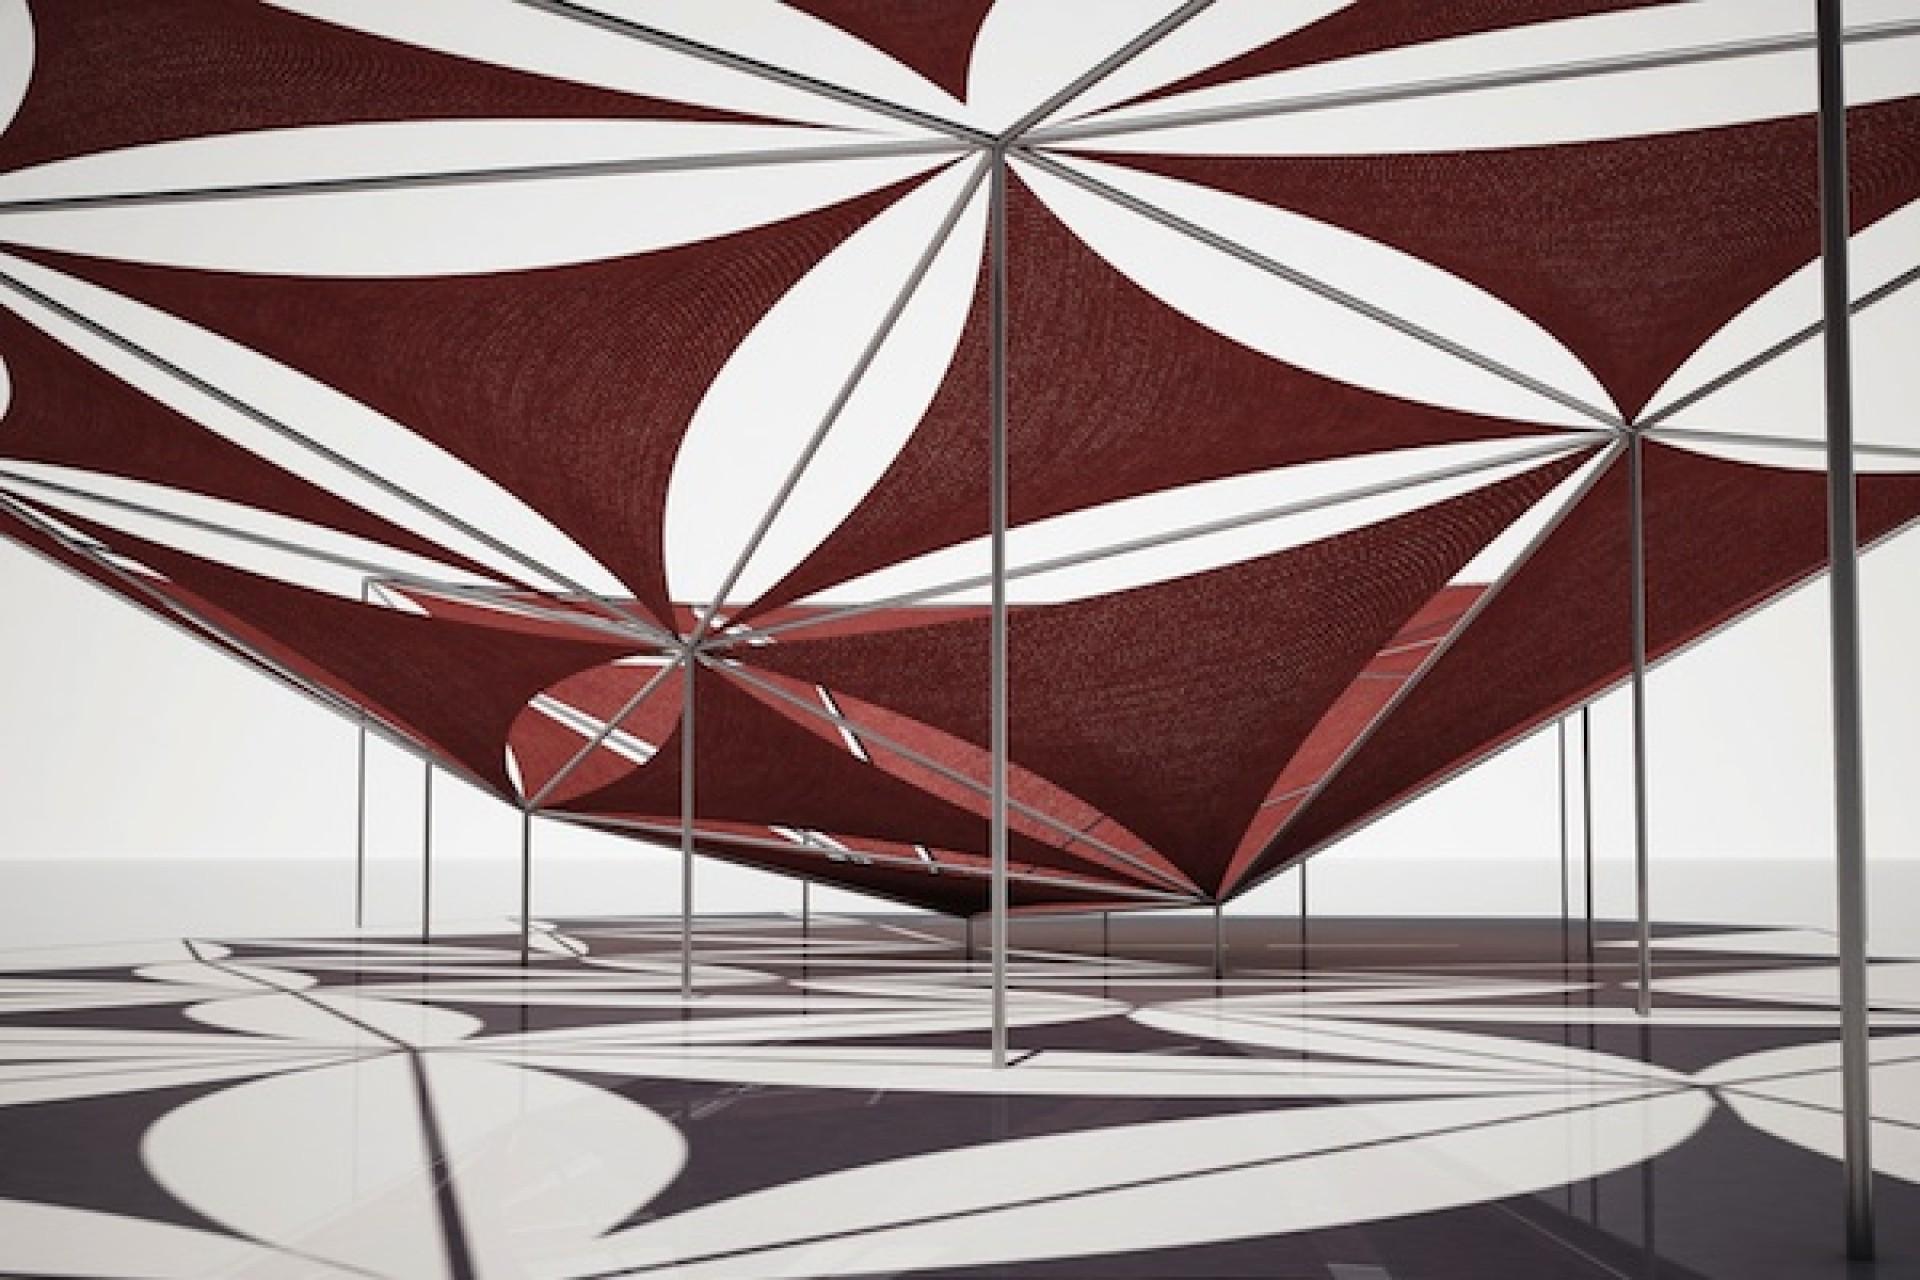 Kinetic Pavilion by Elise Elsacker and Yannick Bontinckx